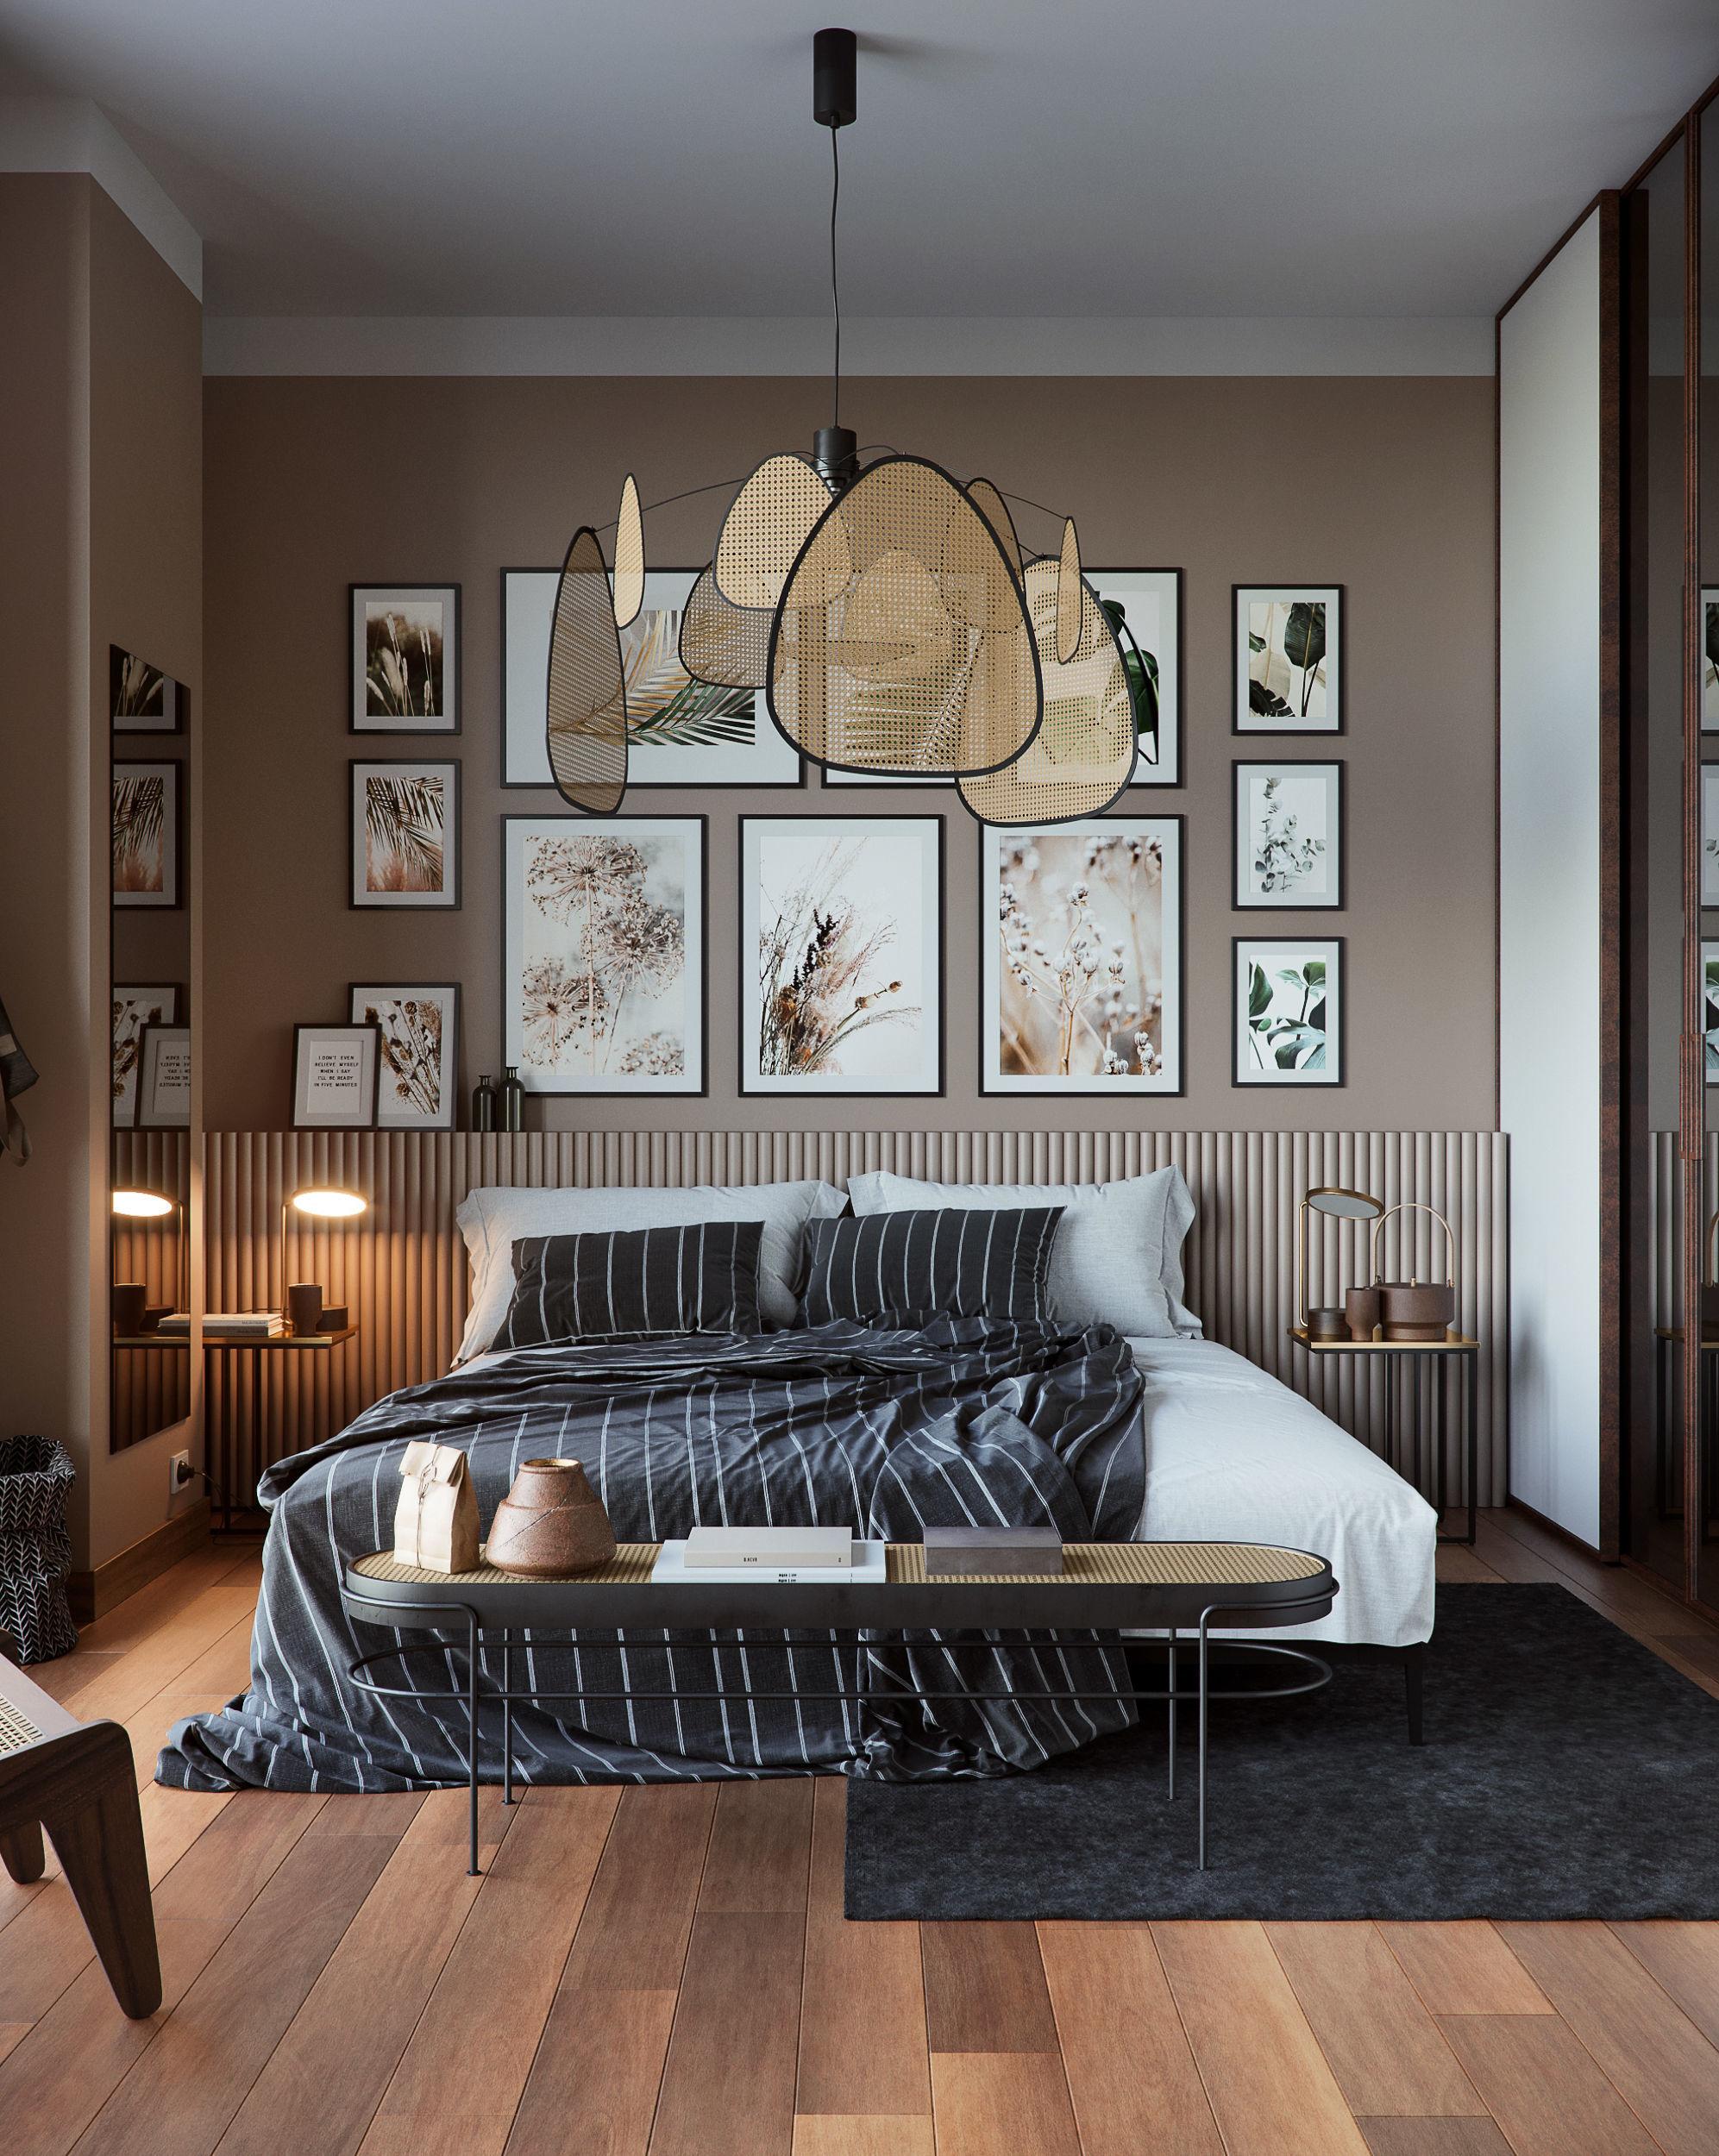 Vienna straw bedroom interior scene